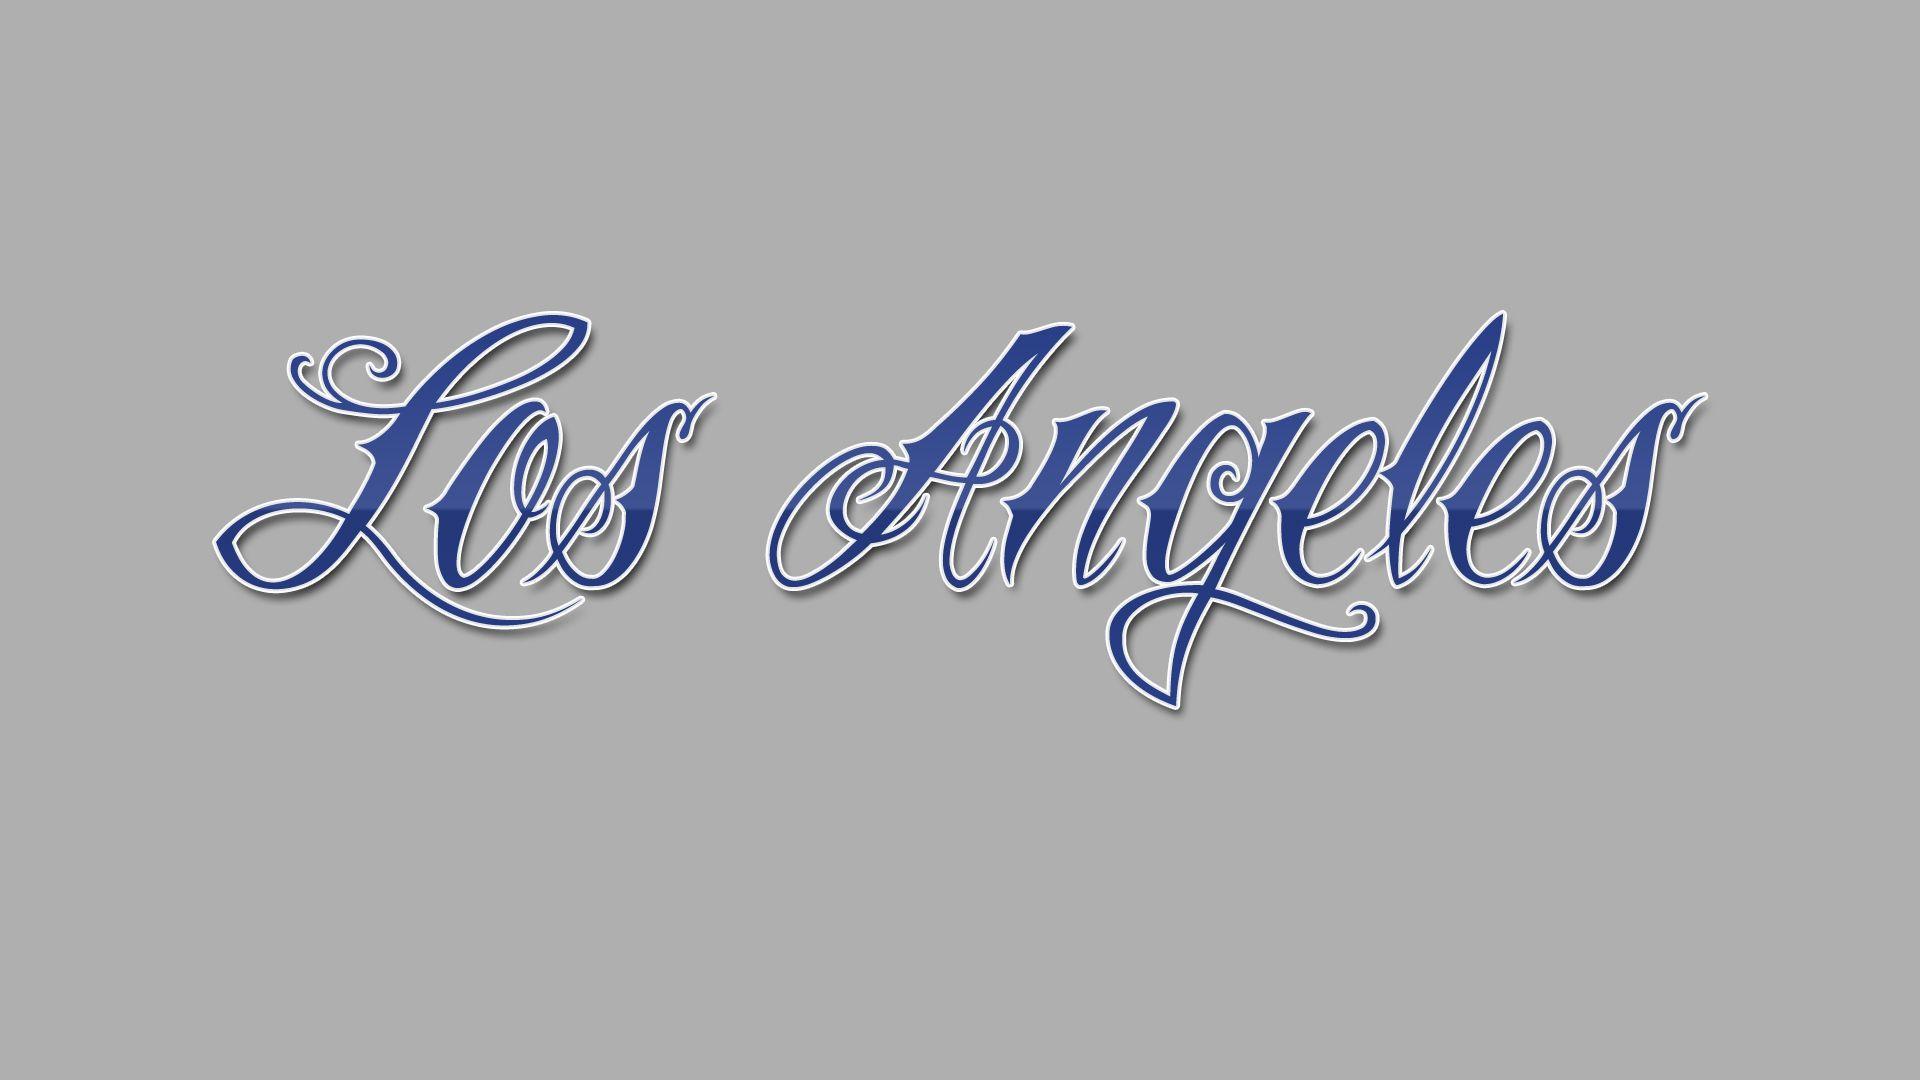 Los Angeles Dodgers Dodgers Los Angeles Dodgers